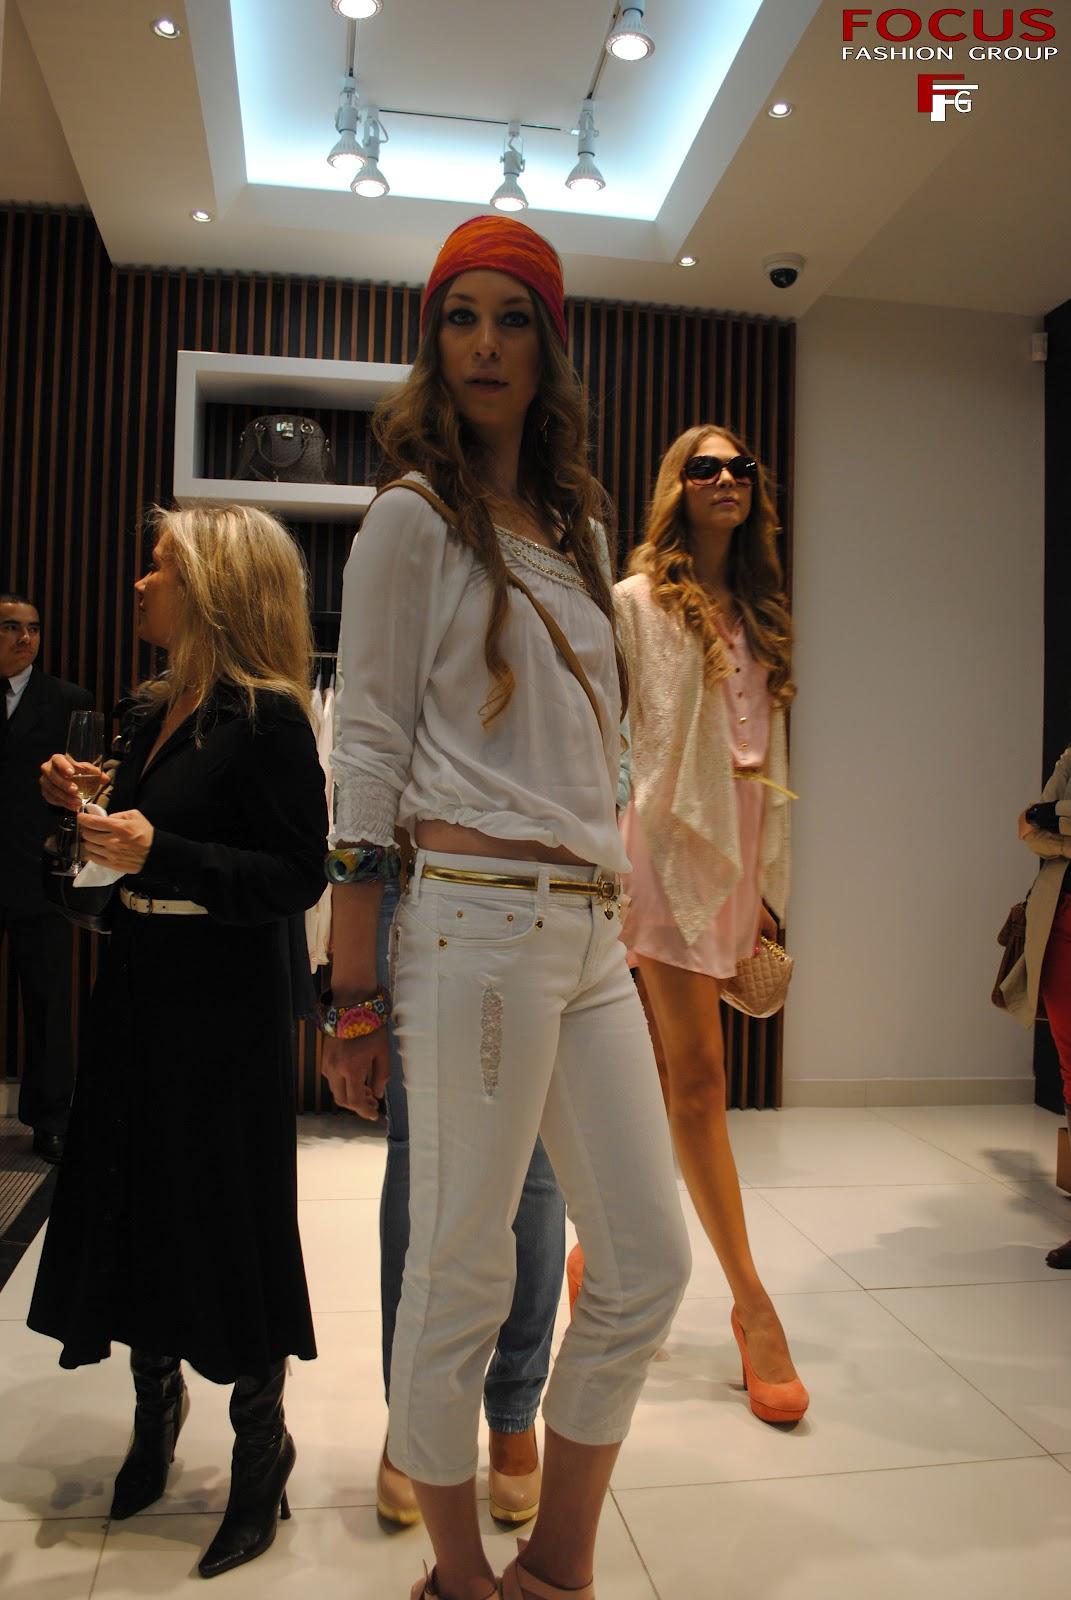 Welcome: DK Company Focus fashion grp inc